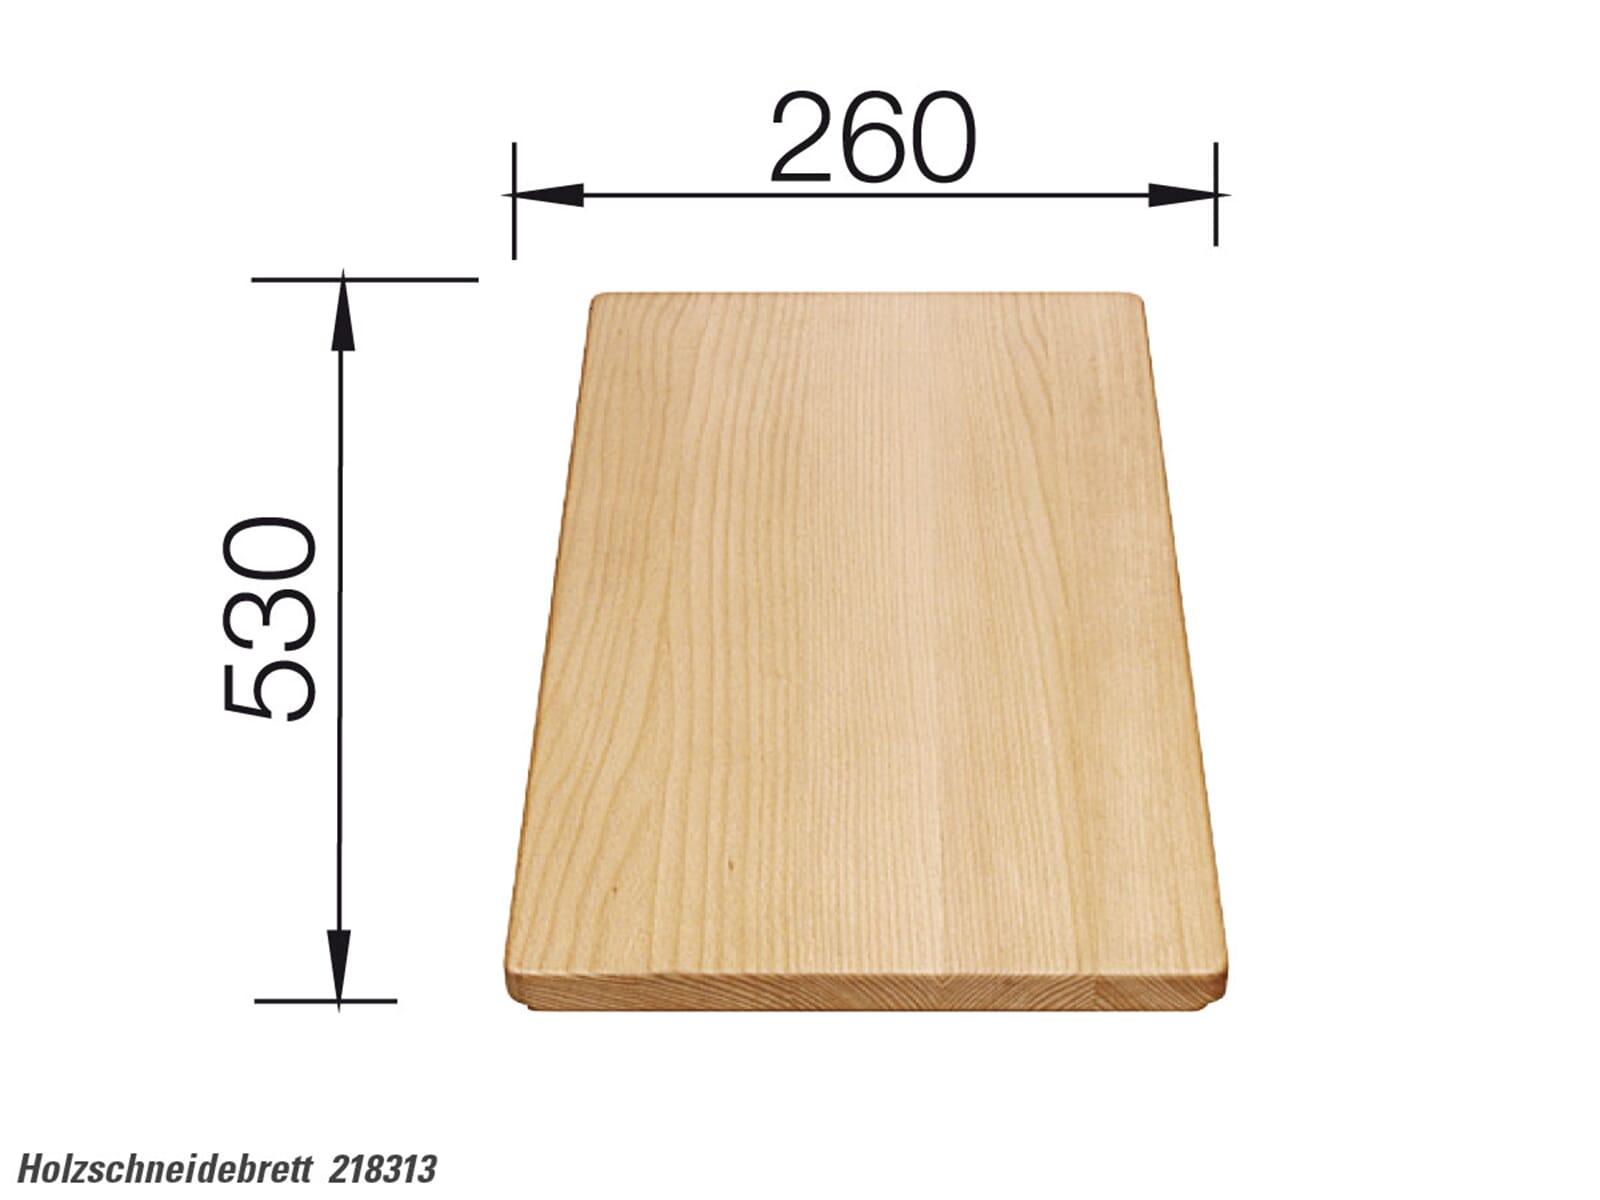 Blanco 218 313 Holzschneidebrett Buche